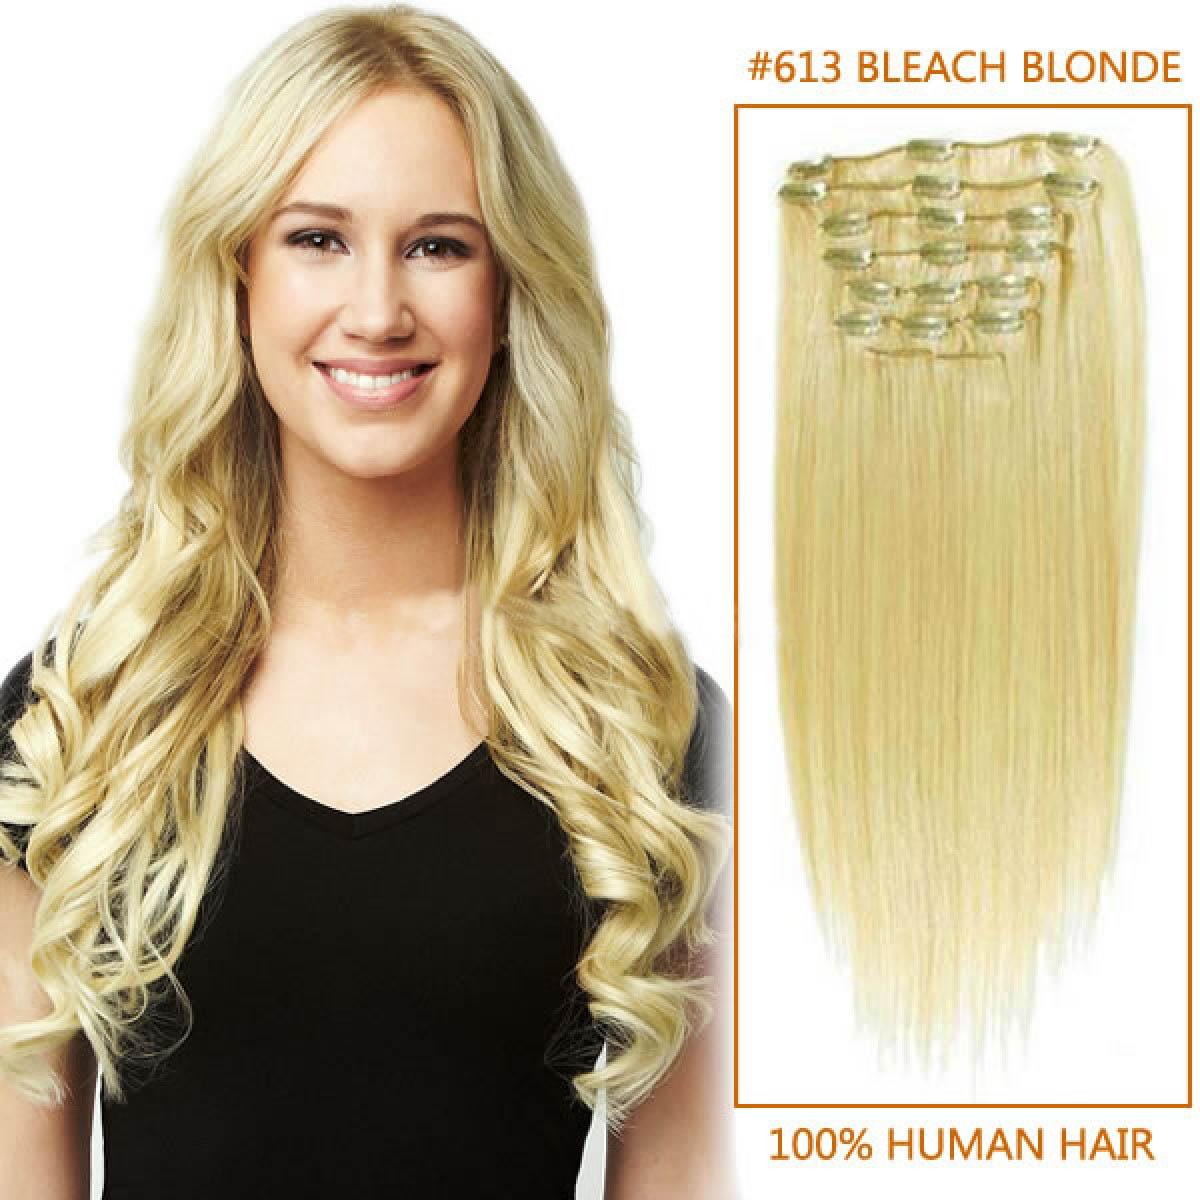 Inch 613 bleach blonde clip in remy human hair extensions 7pcs 22 inch 613 bleach blonde clip in remy human hair extensions 7pcs pmusecretfo Gallery